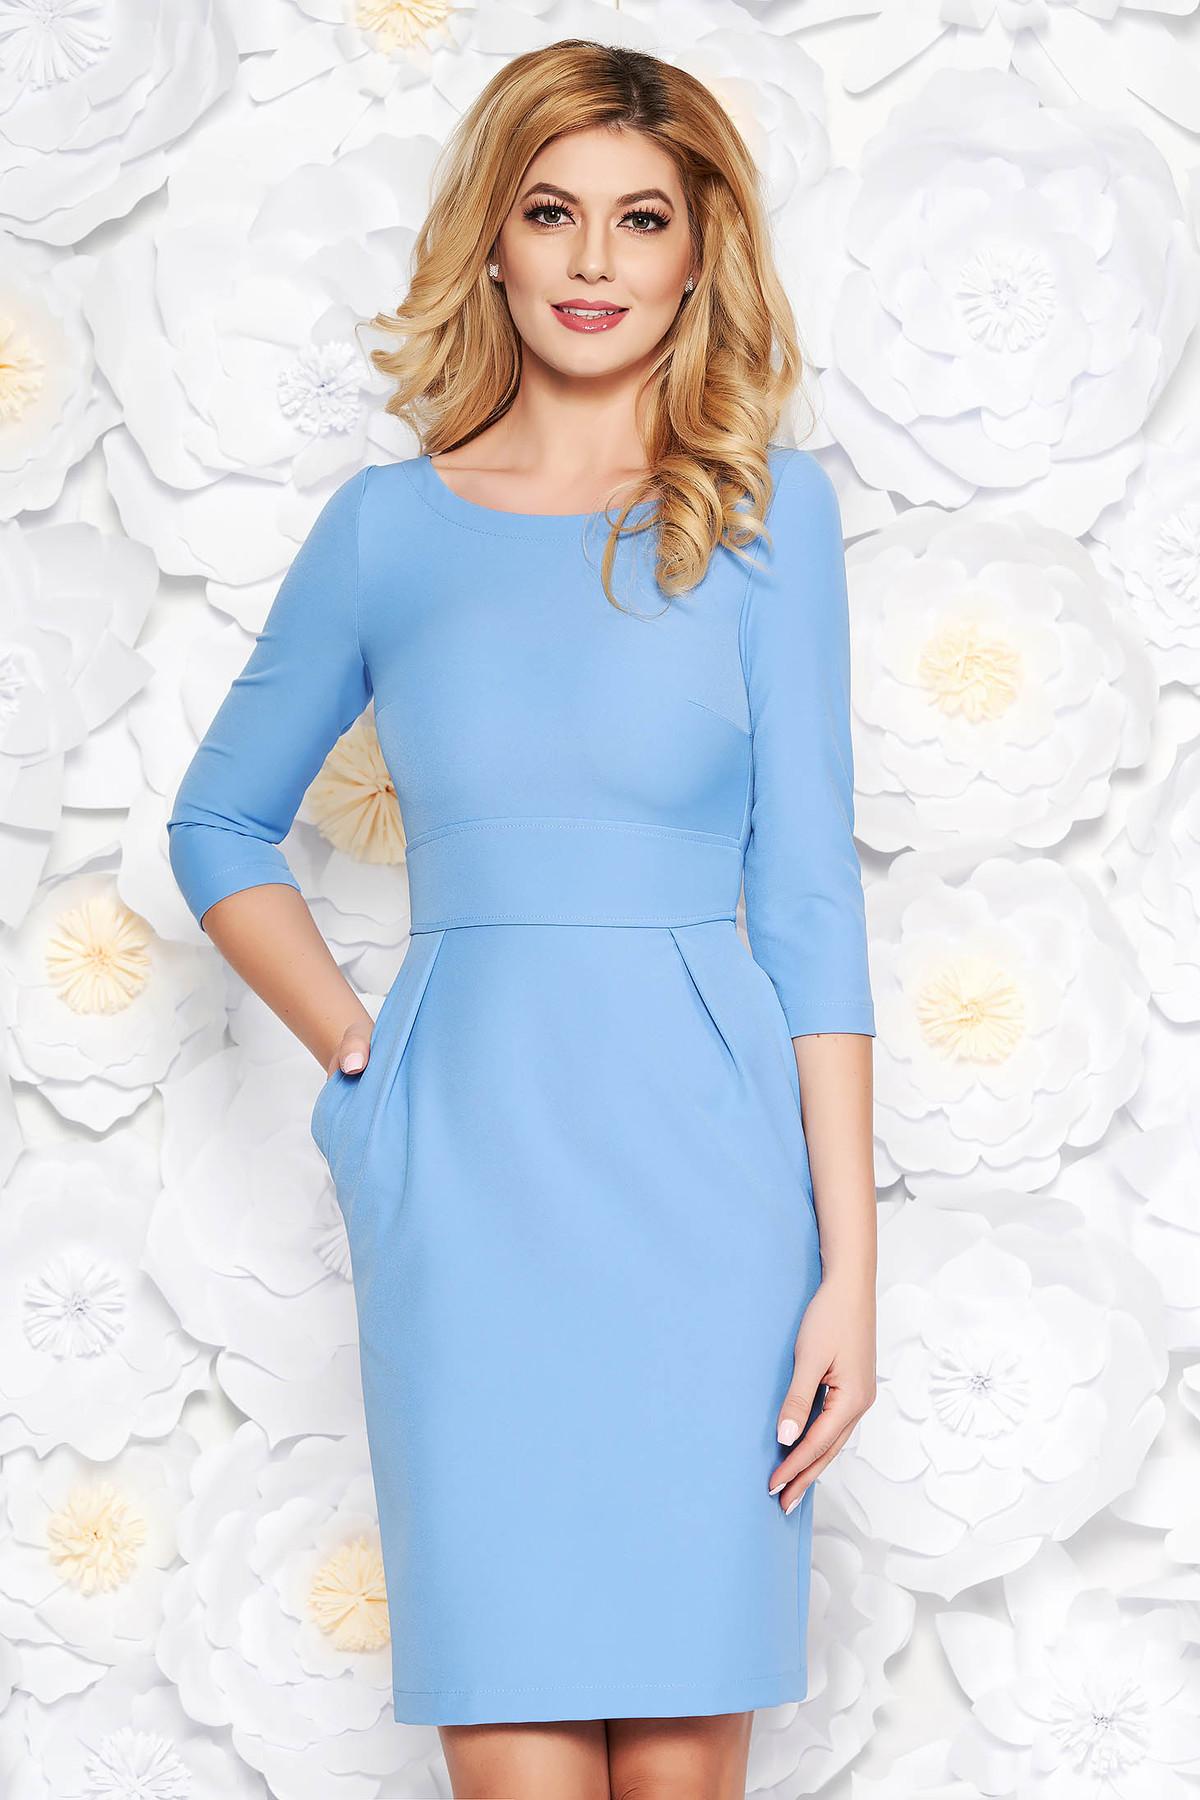 Rochie StarShinerS albastra office din stofa usor elastica cu buzunare